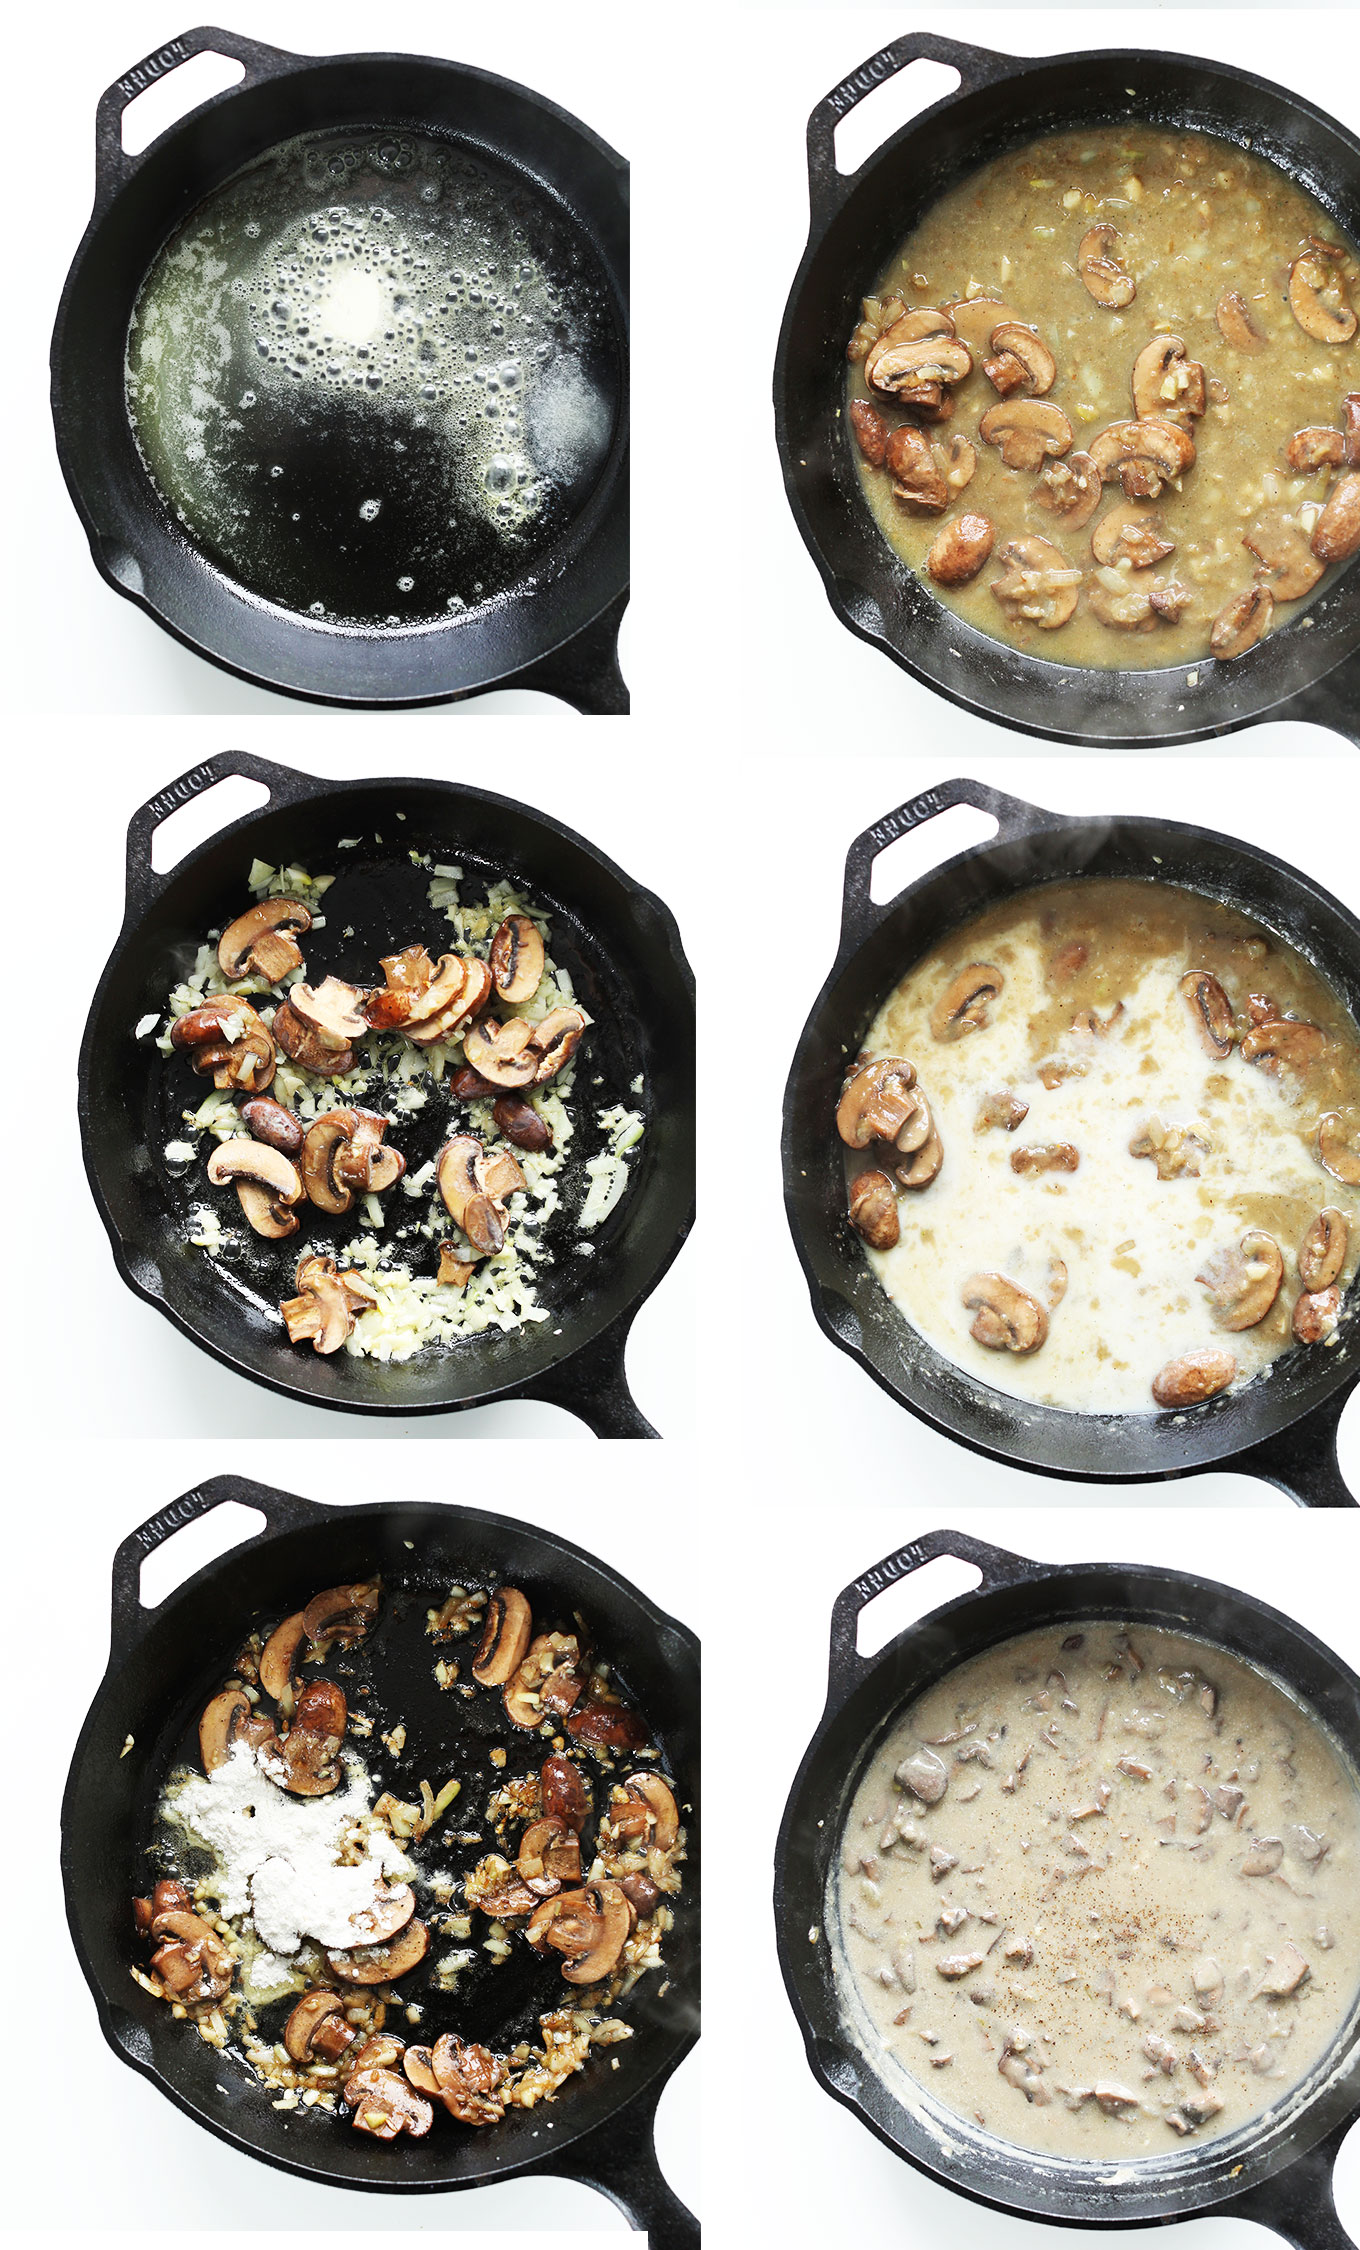 Photos showing steps for making homemade vegan Mushroom Gravy in a cast-iron skillet